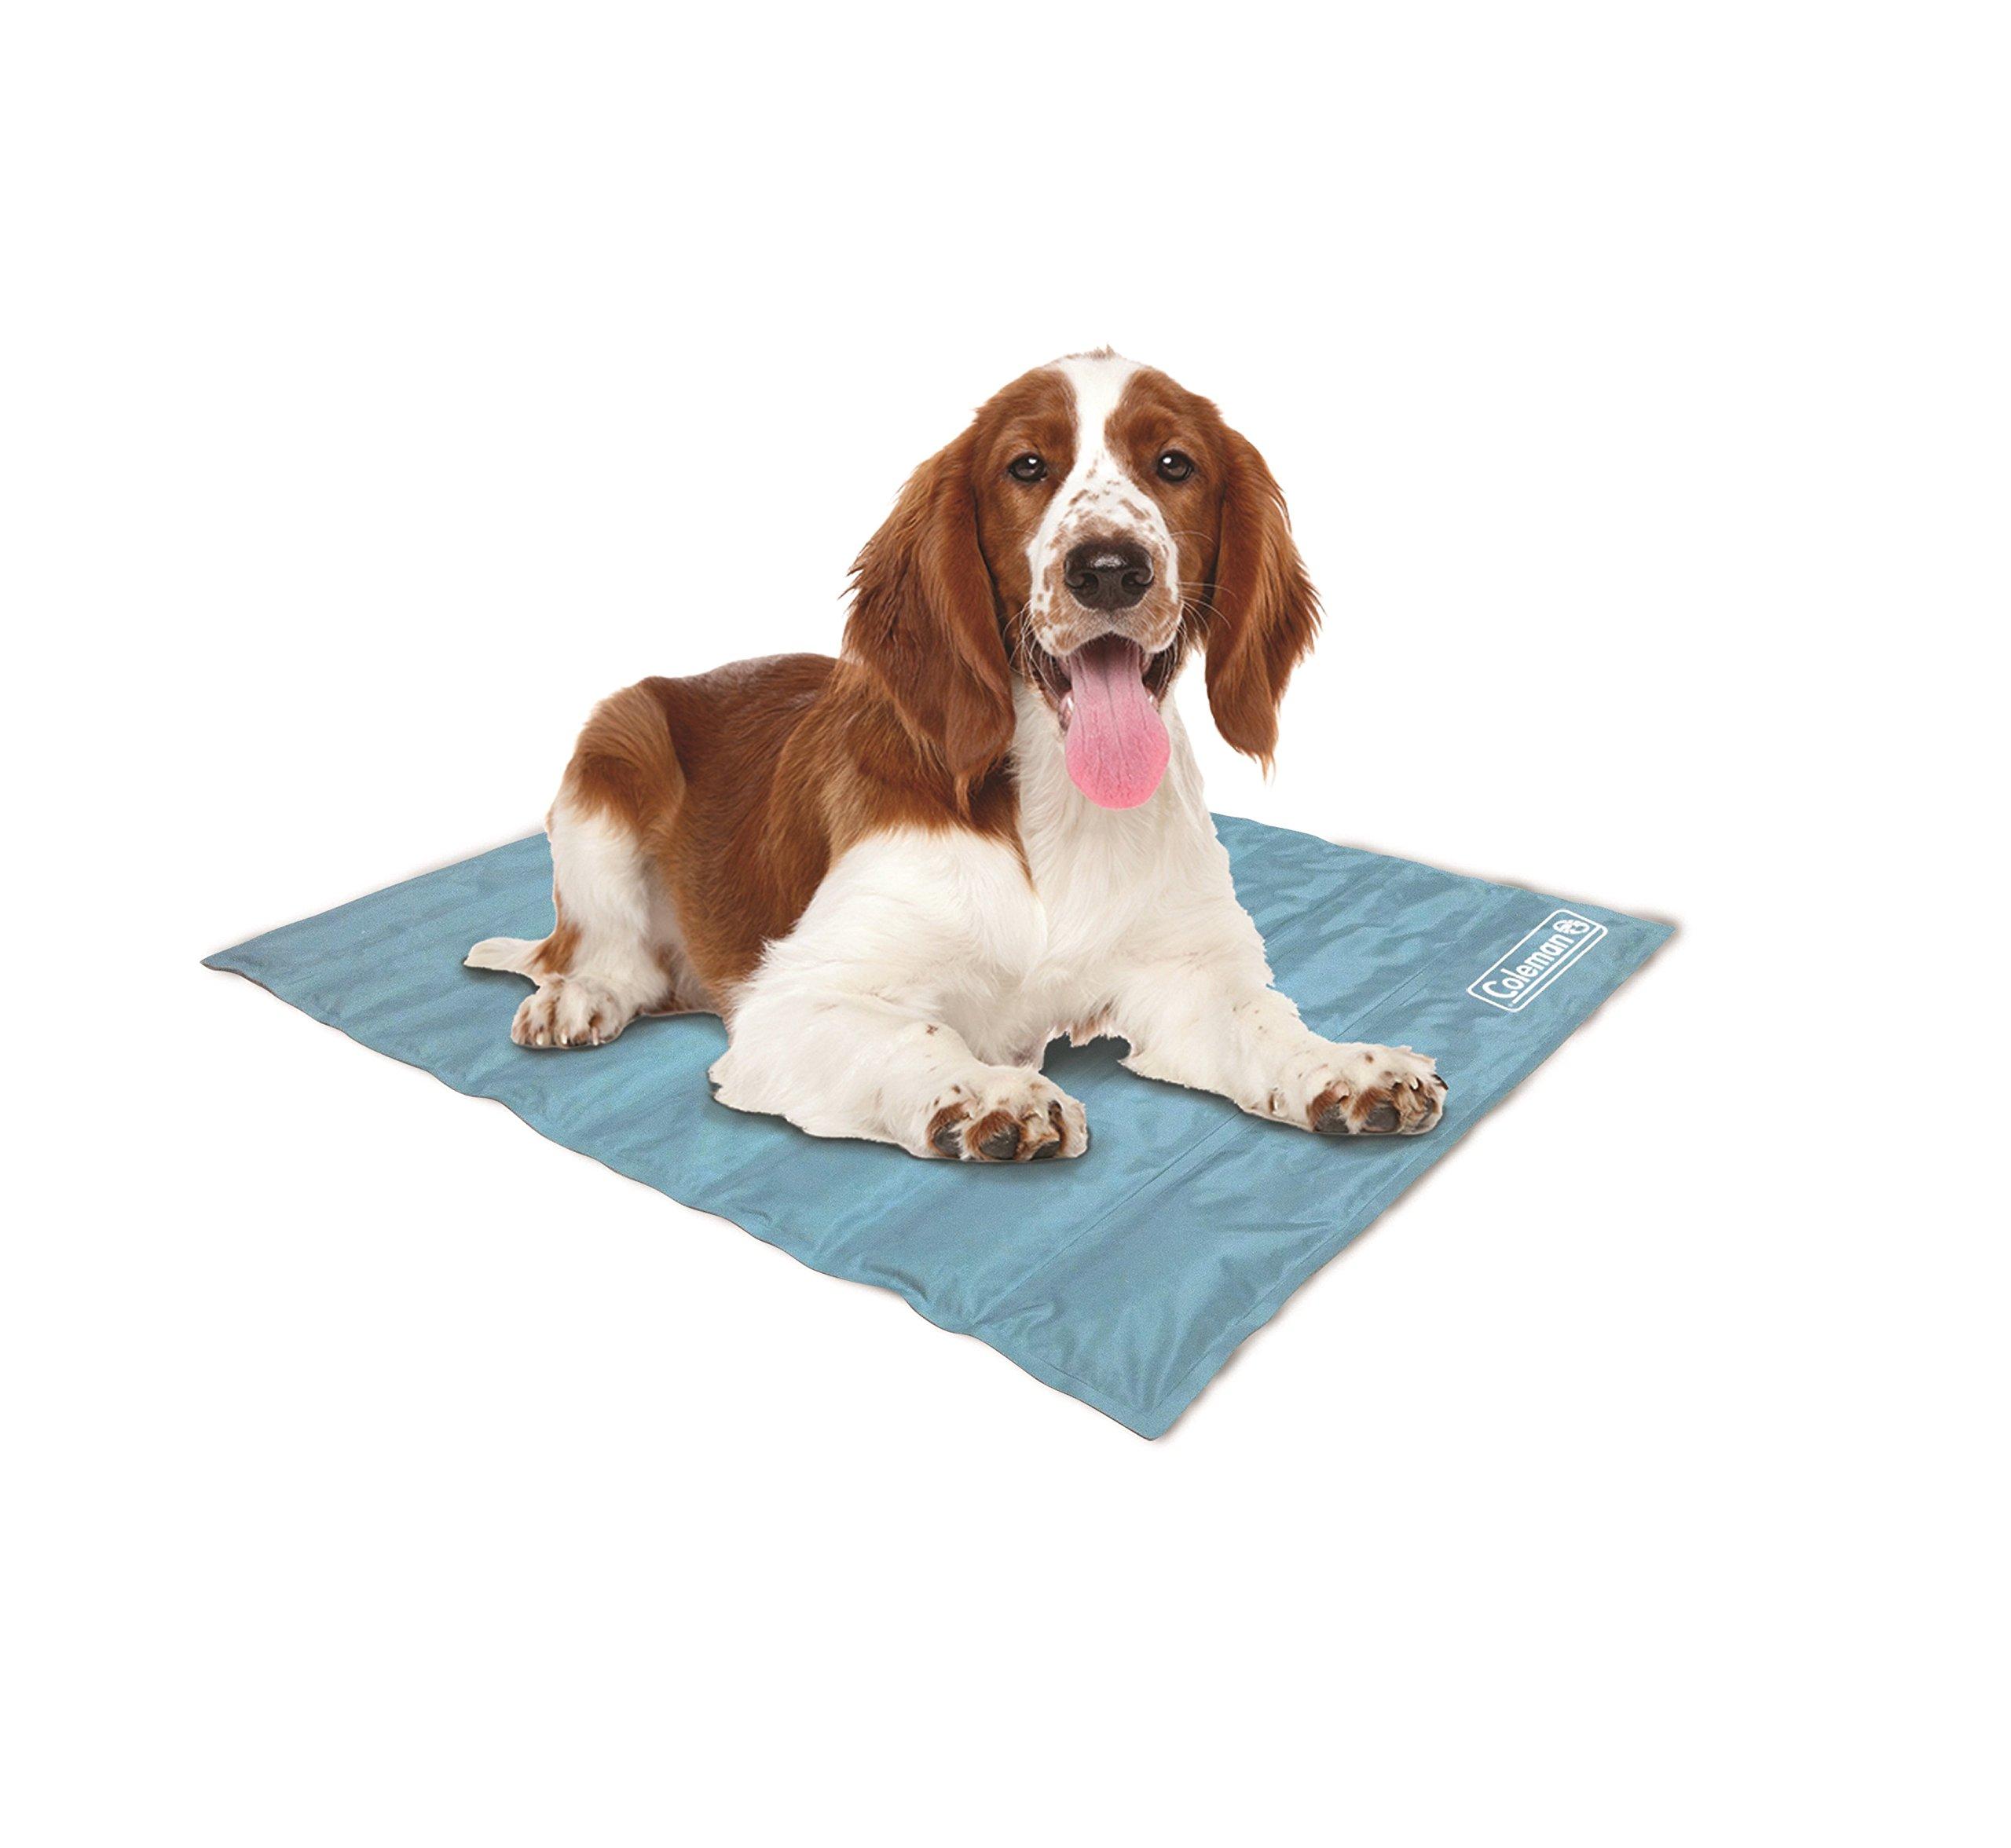 Coleman Comfort Cooling Gel Pet Pad Mat in Medium 24''x30'', For Medium Pets (Blue) by Coleman (Image #1)